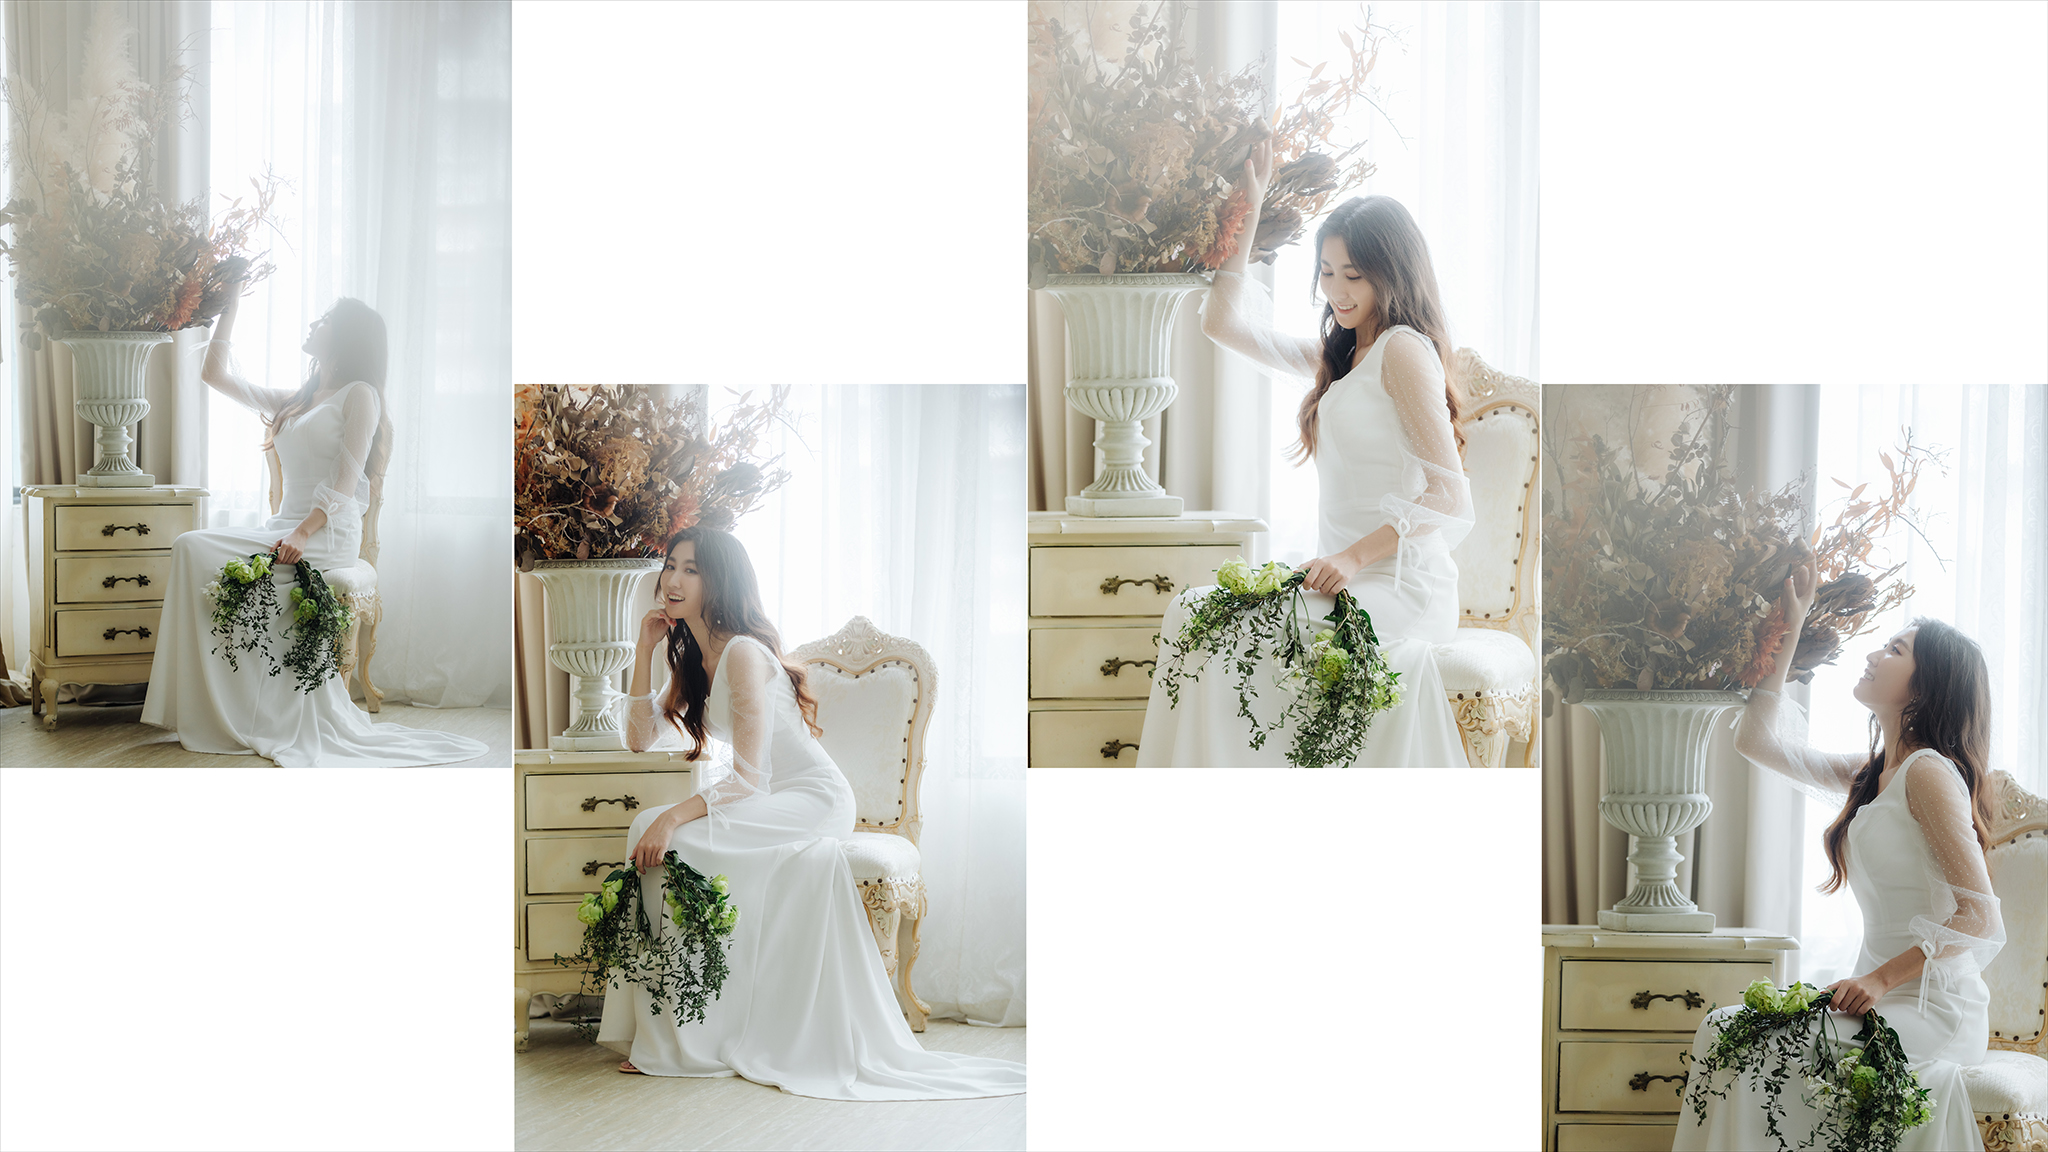 49928737988 29fec65926 o - 【閨蜜婚紗】+Jessy & Tiffany+